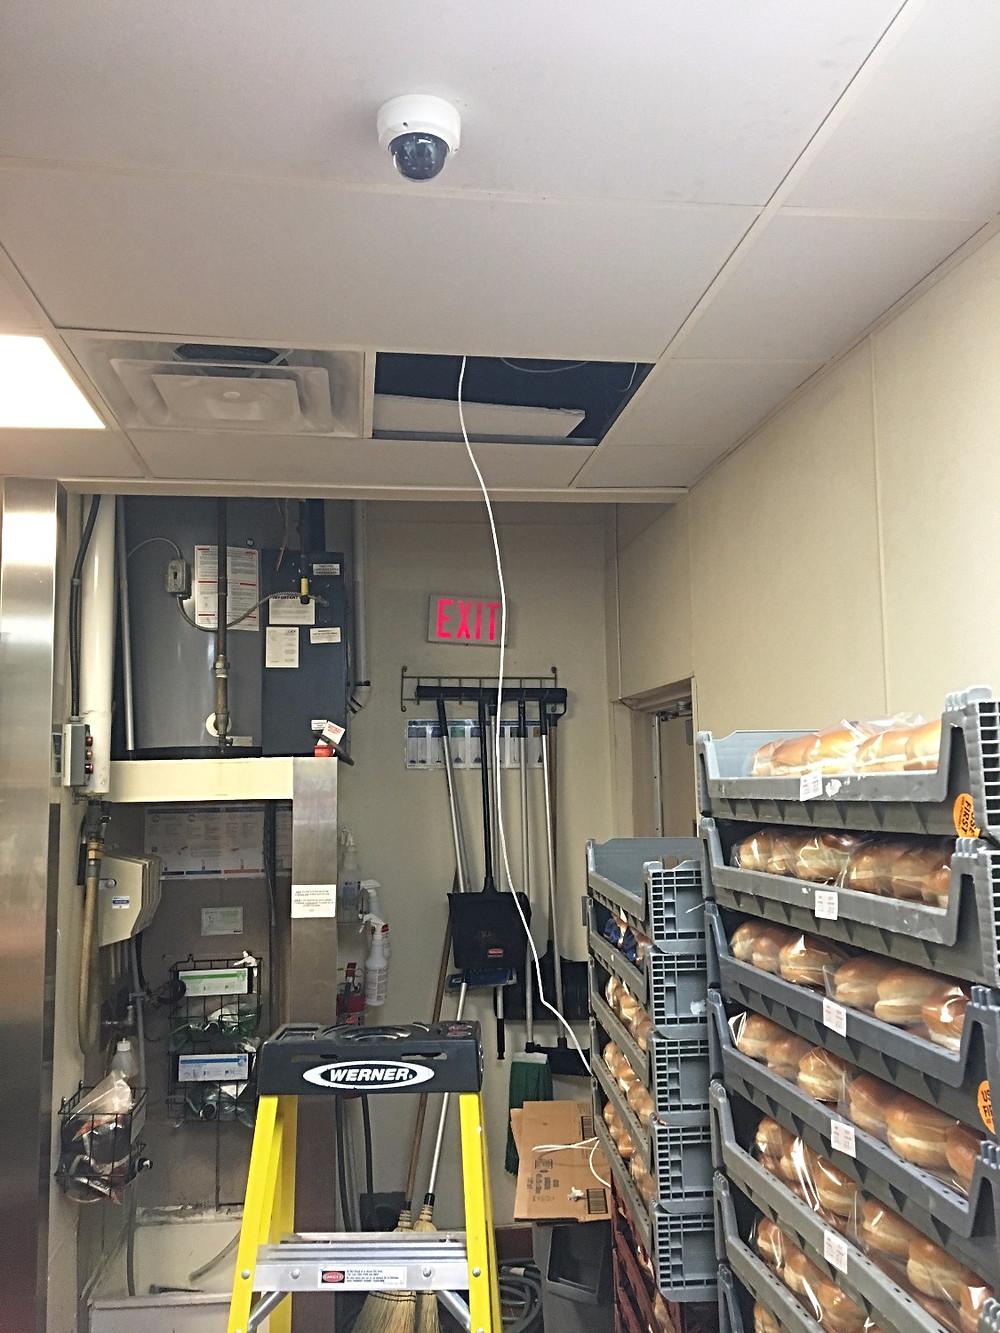 Inventory surveillance